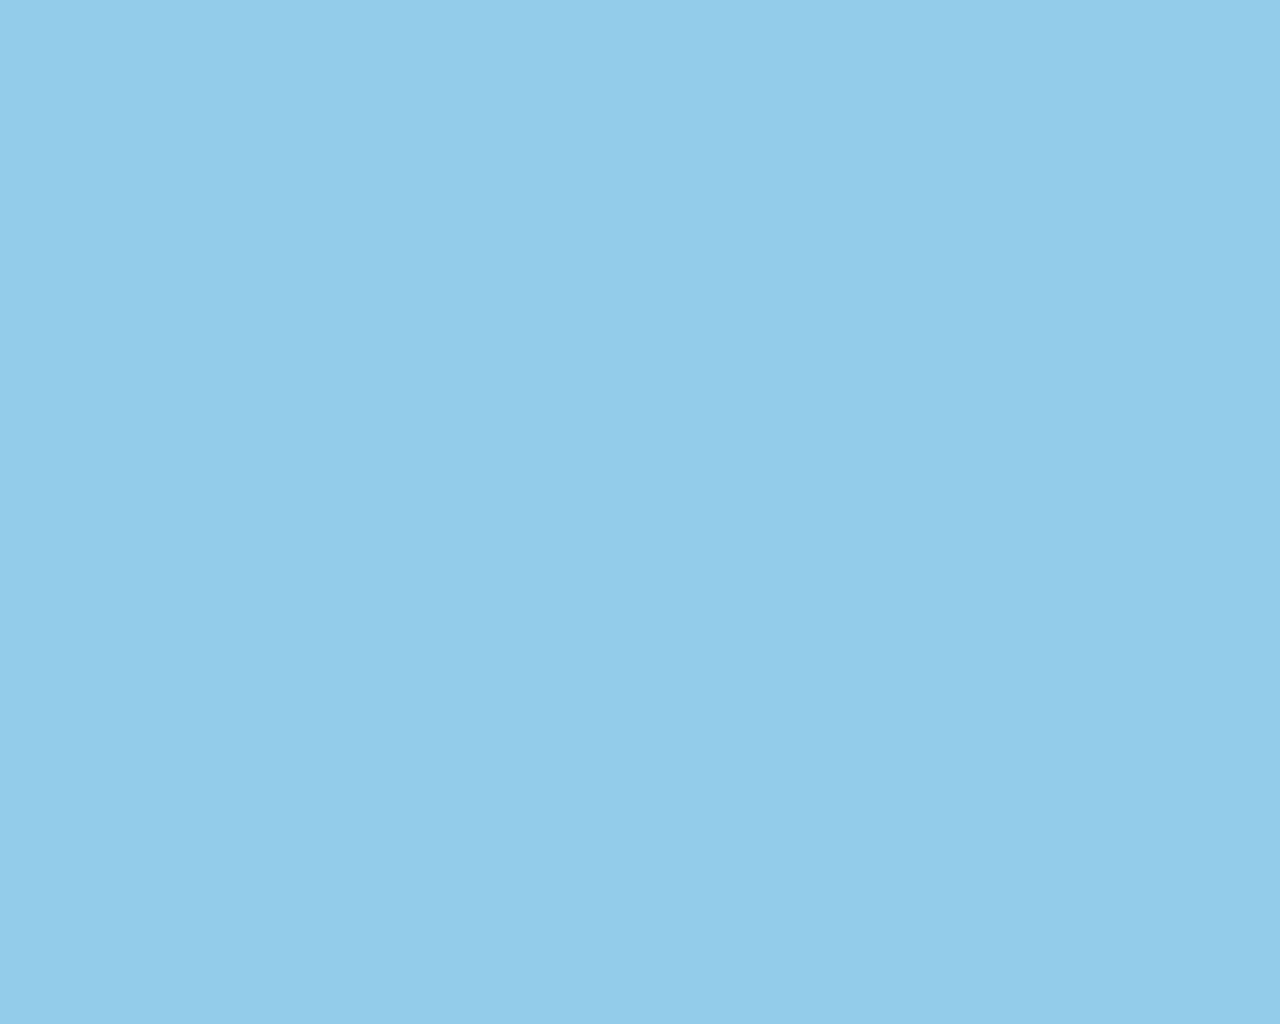 1280x1024 Light Cornflower Blue Solid Color Background